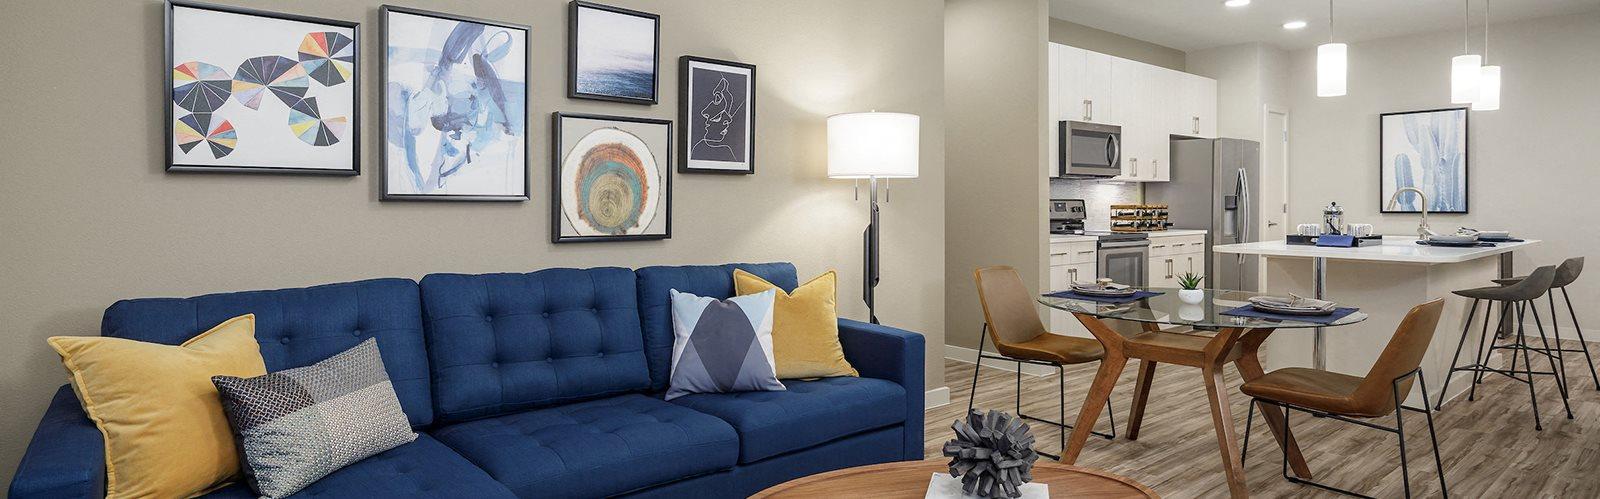 Renovated Apartments at The Baldwin at St. Paul Square, San Antonio, TX, 78205